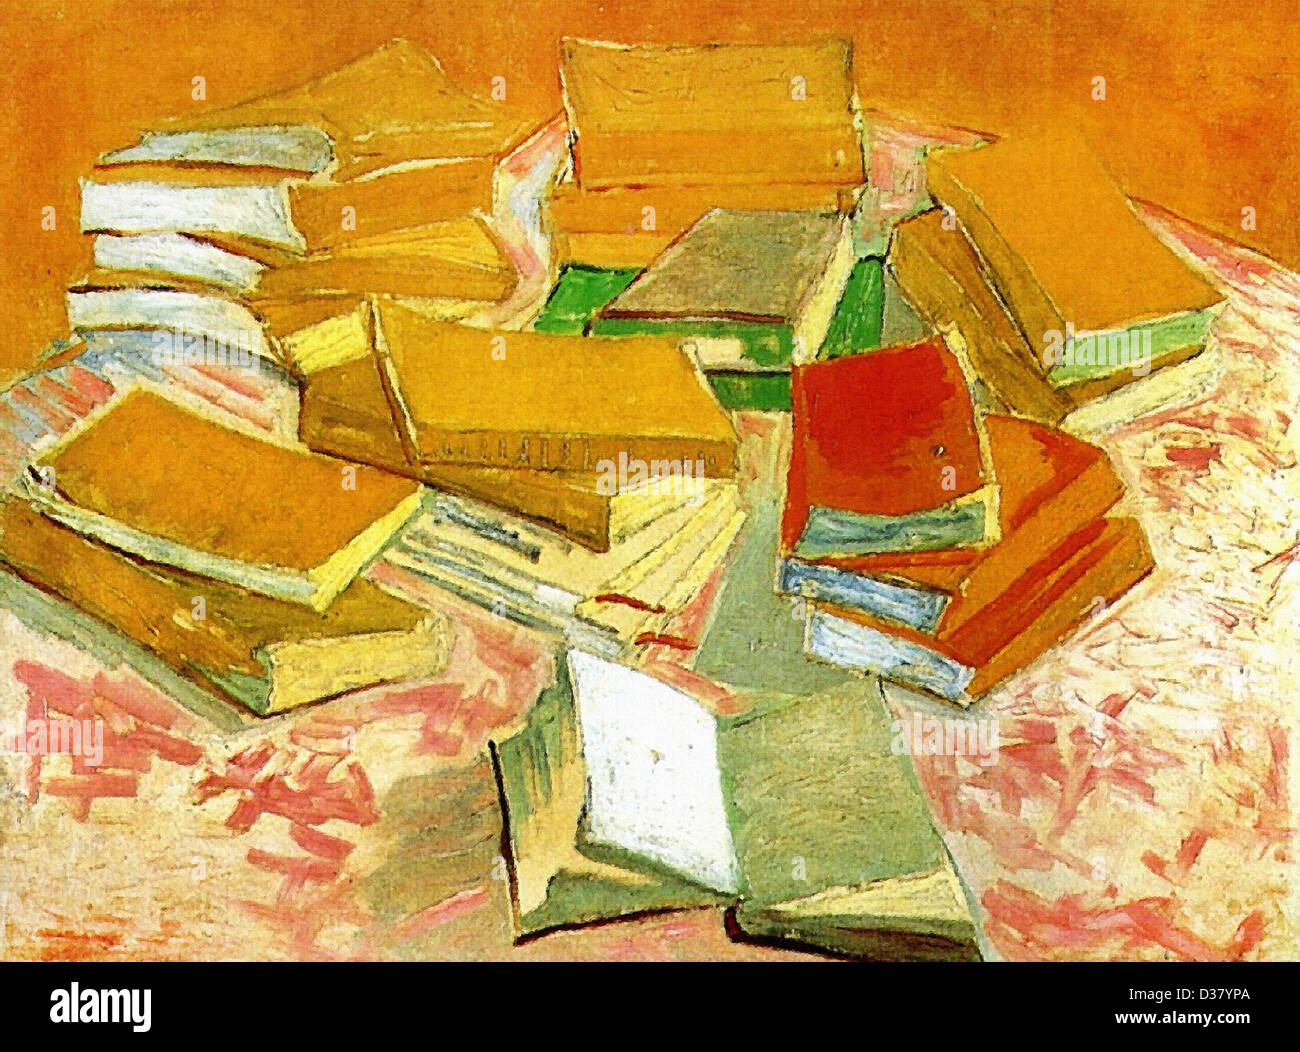 Vincent van Gogh, Still Life - French Novels. 1888. Post-Impressionism. Oil on canvas. Van Gogh Museum, Amsterdam, - Stock Image